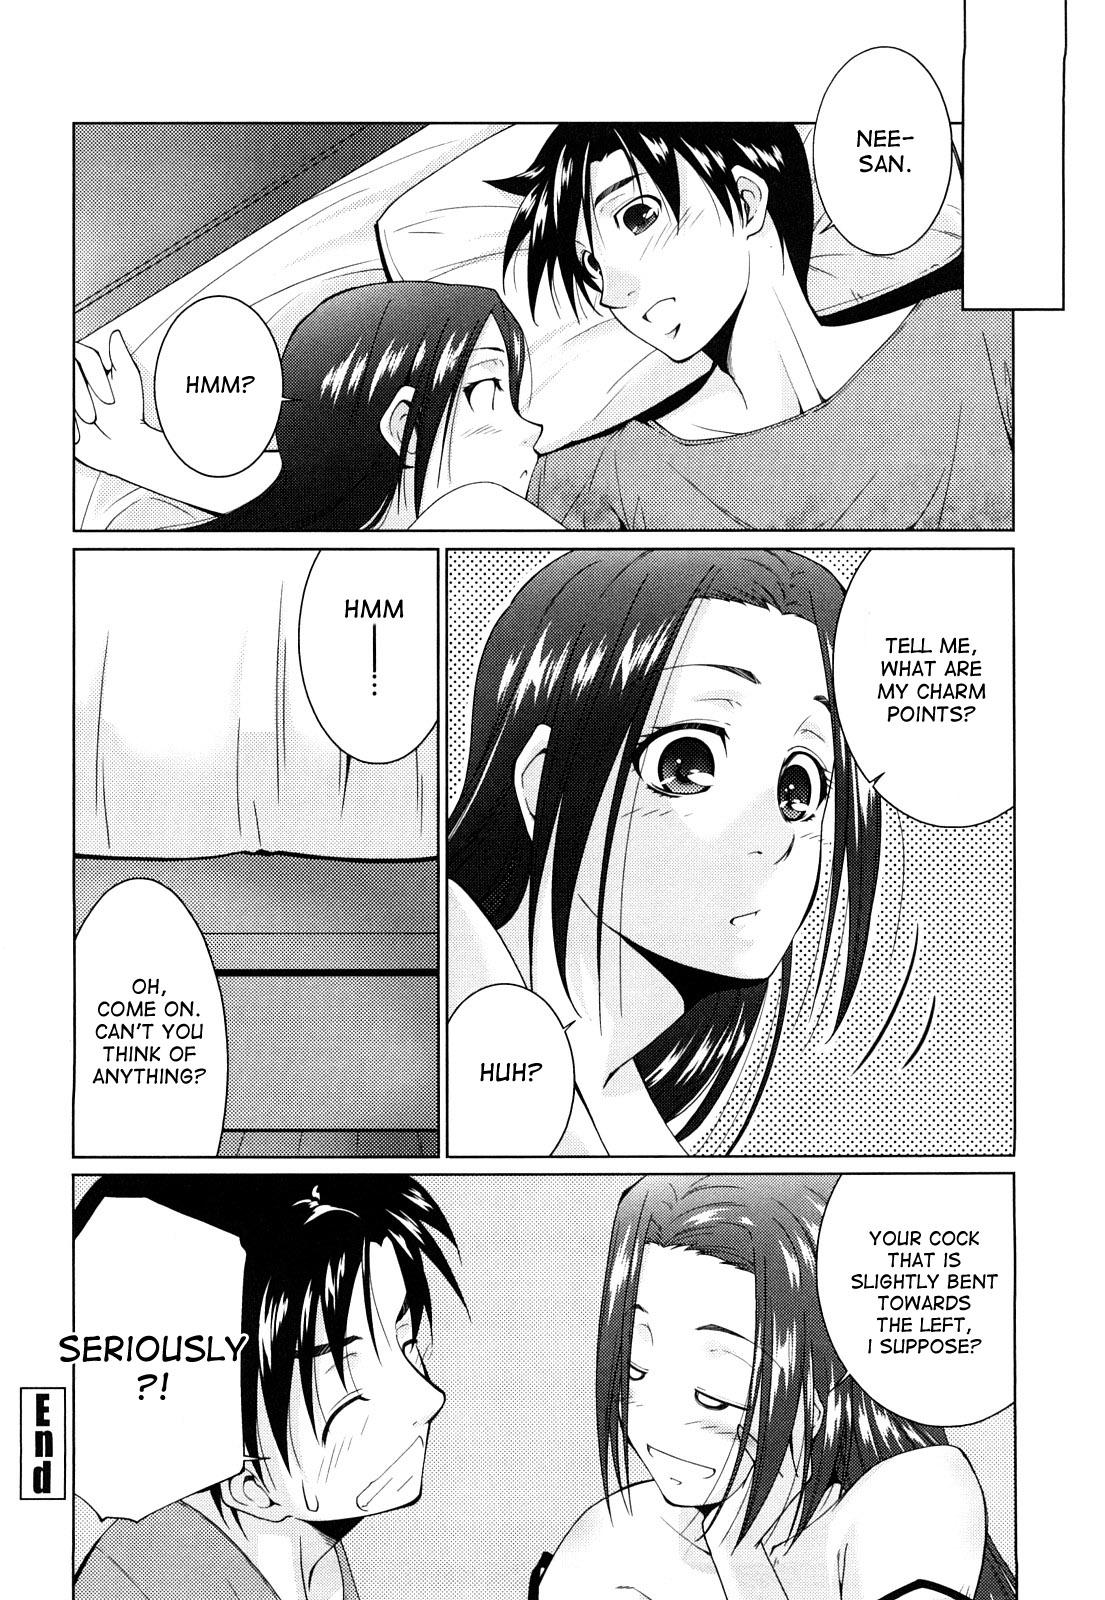 [Touma Itsuki] Ane-sama Inkou - Sister's Sexy Smell [English] {desudesu} 51